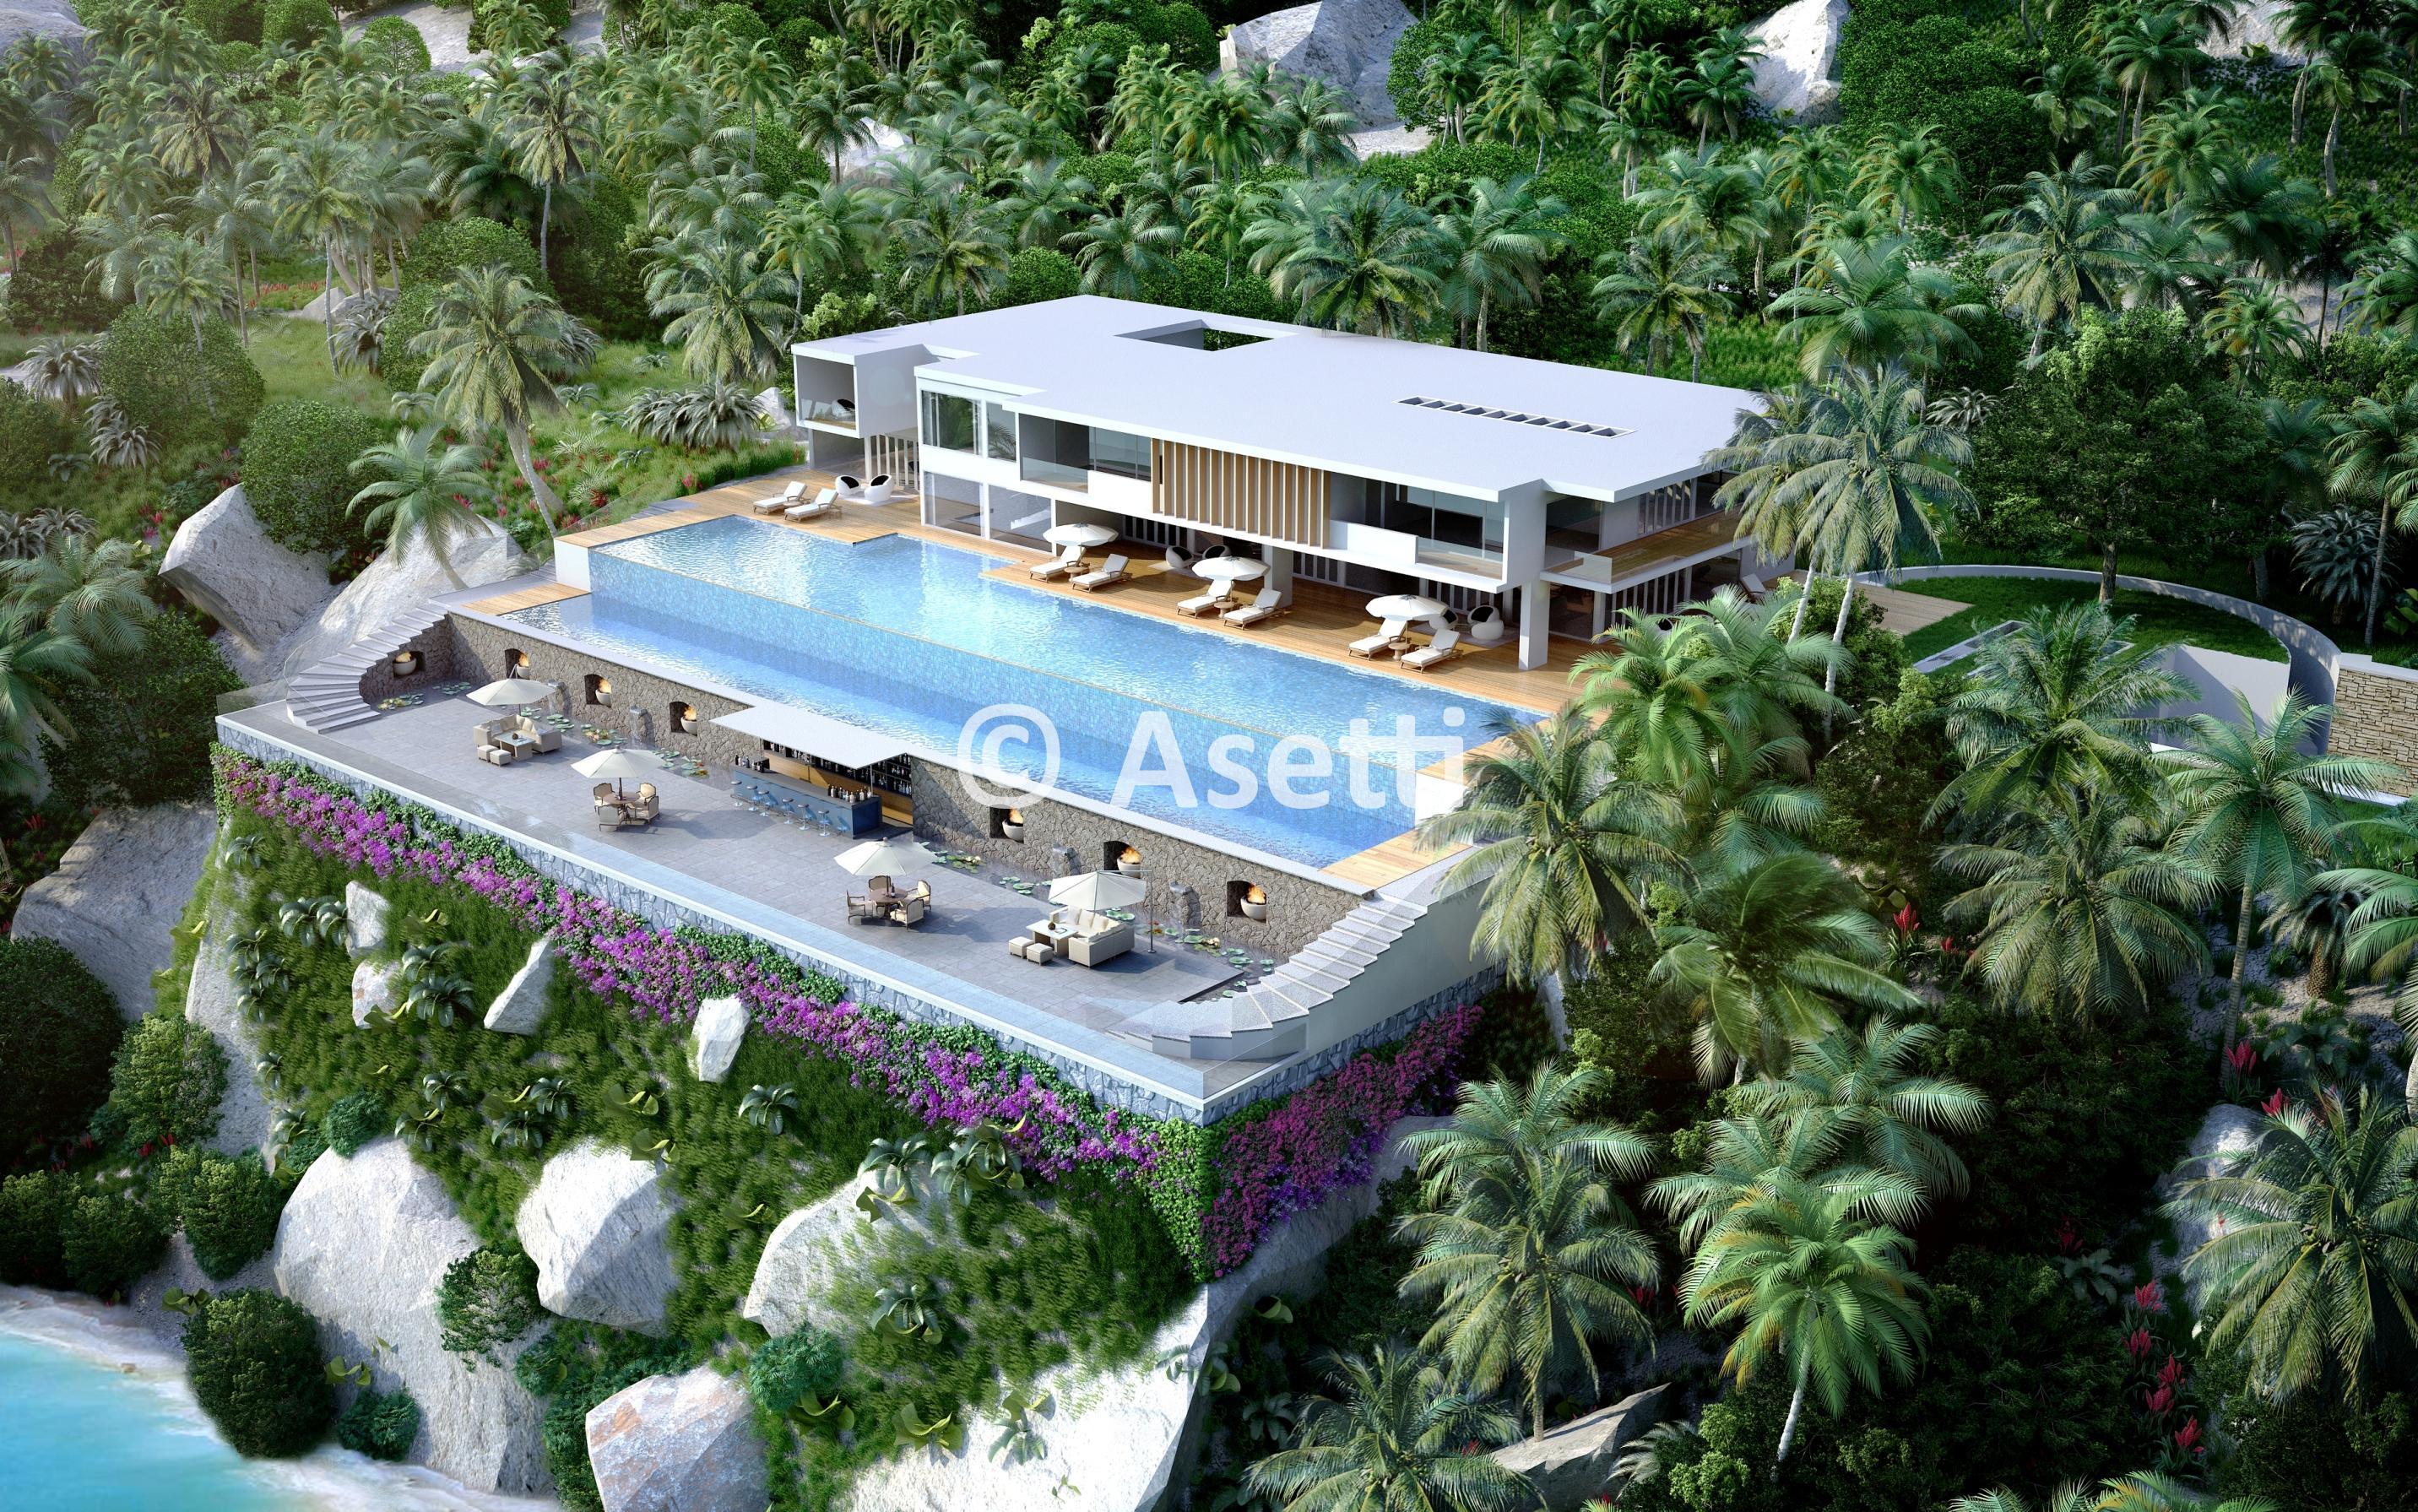 asetti the secret of luxury design the art of design luxury home design magazine subscriptions home design